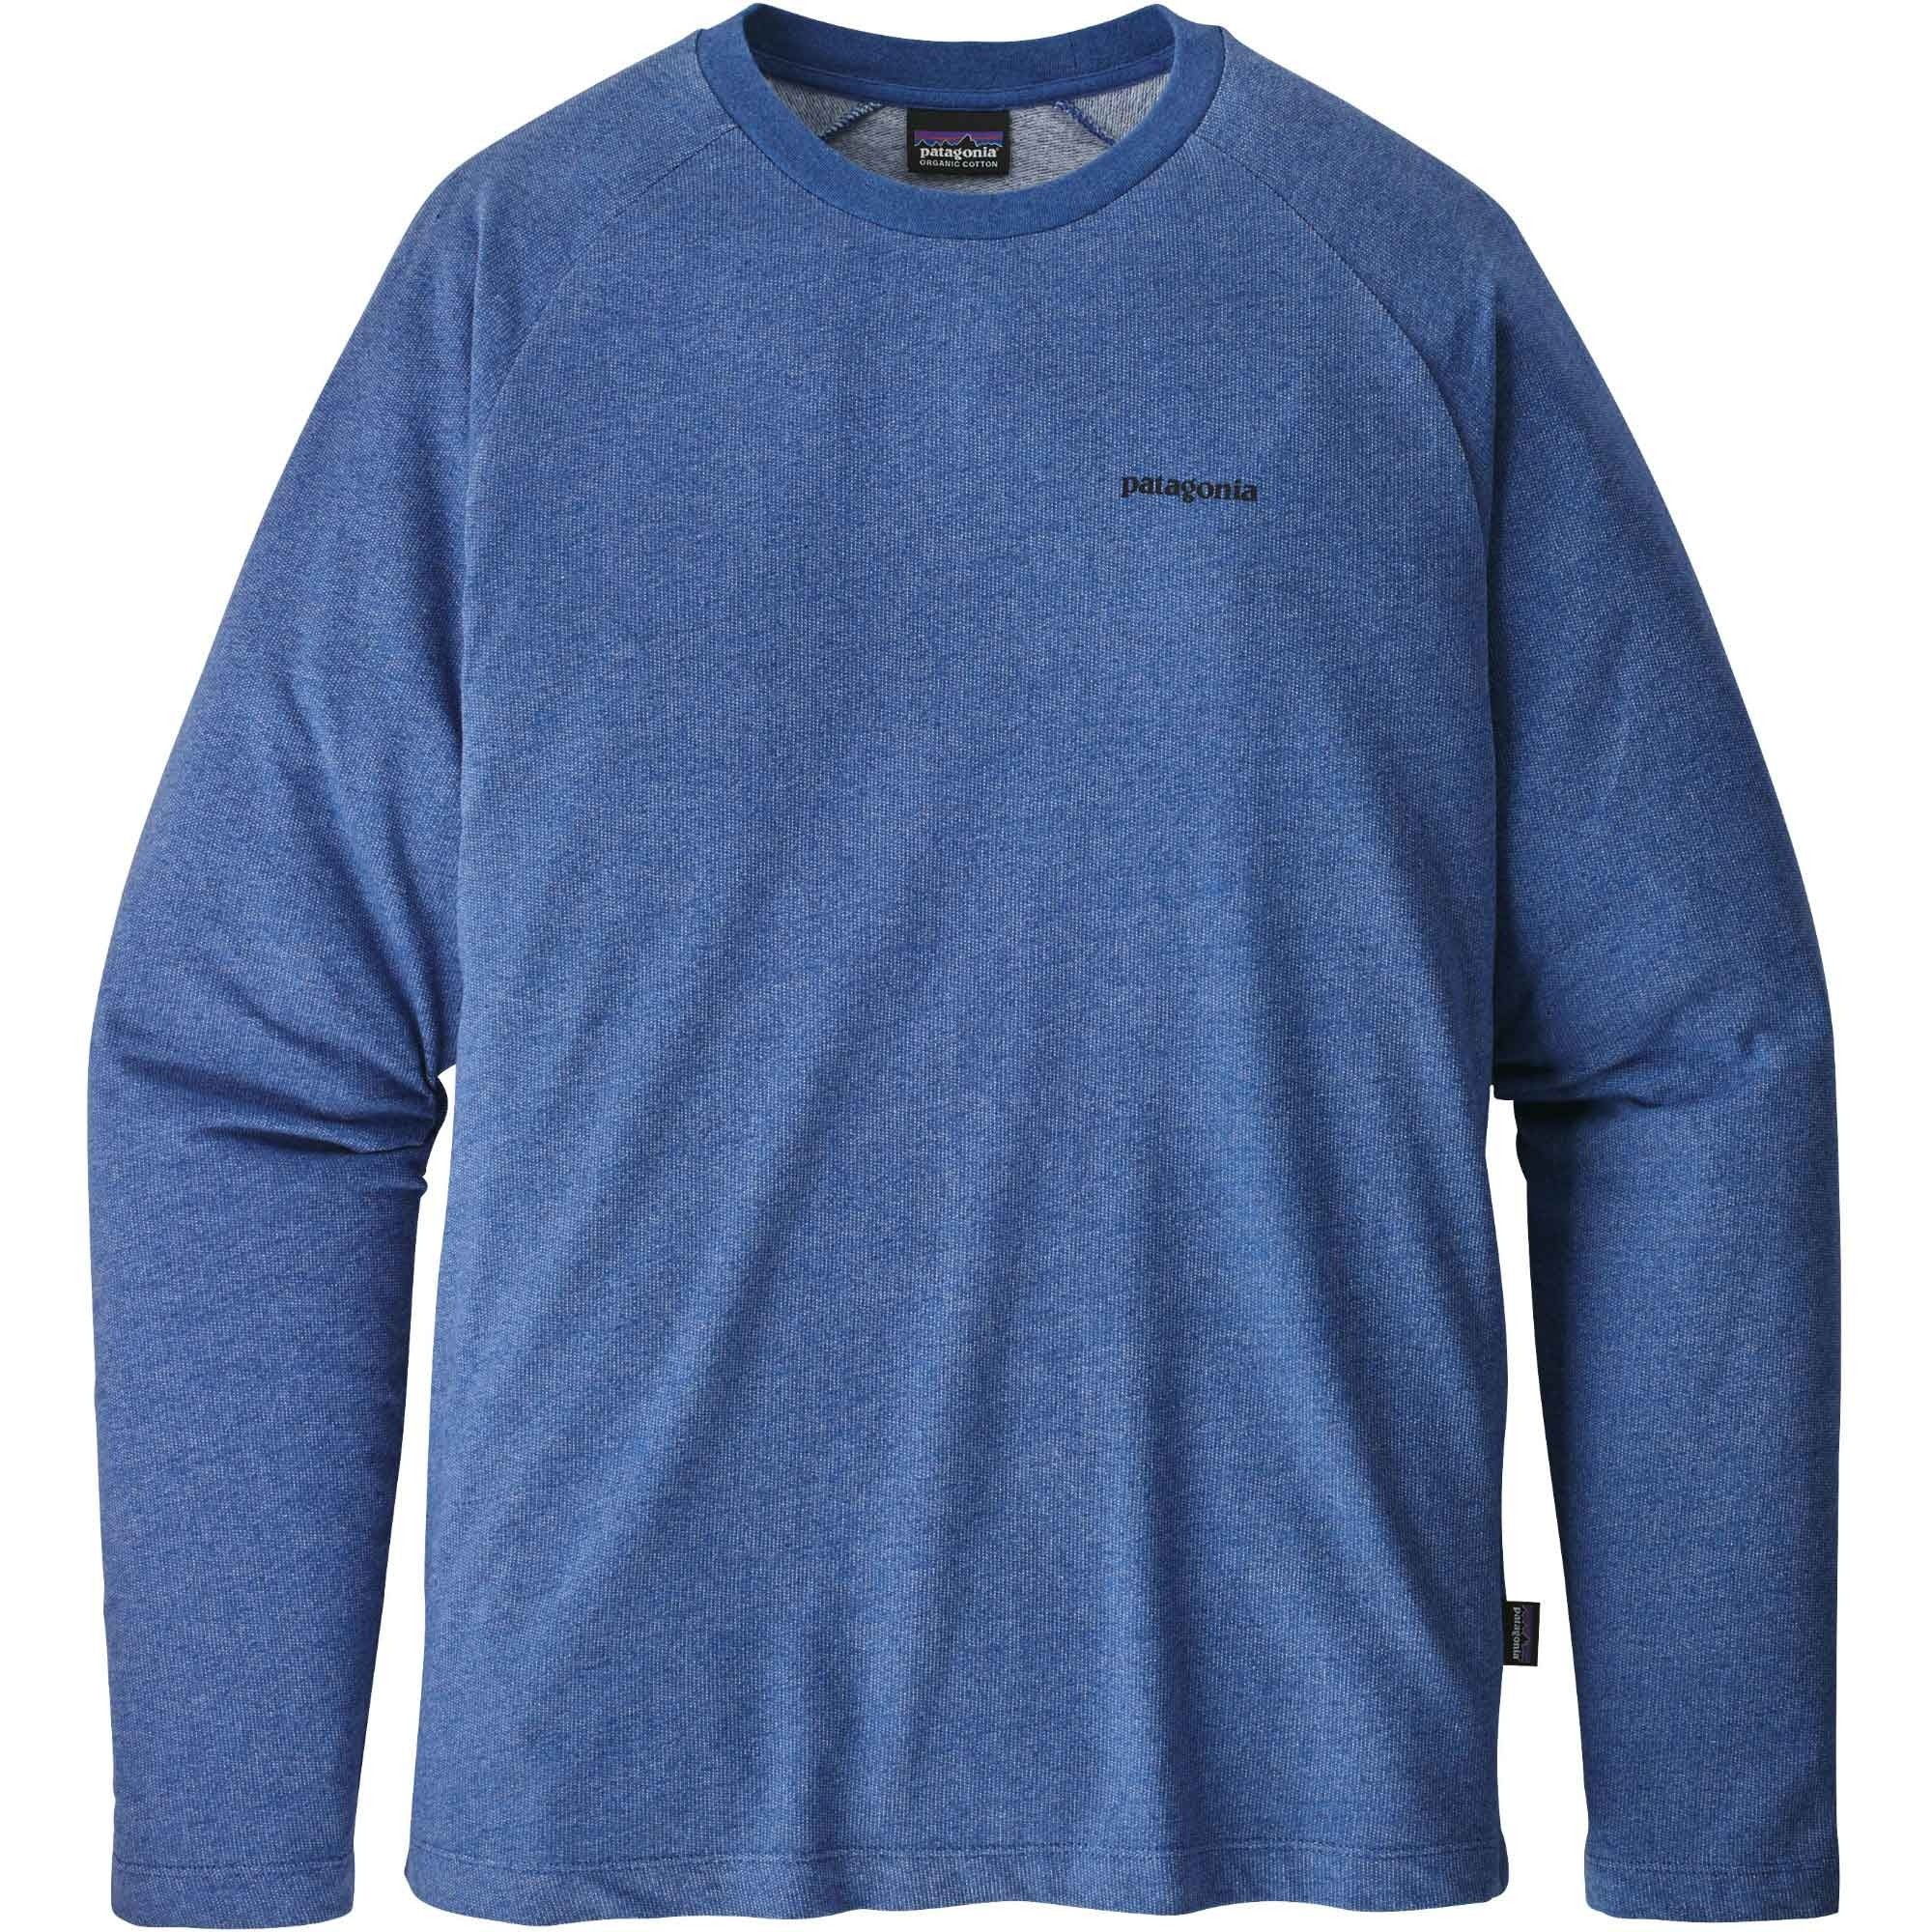 Patagonia-P-6-Logo-Lightweight-Crew-Sweatshirt-Mens-Superior-Blue-S18